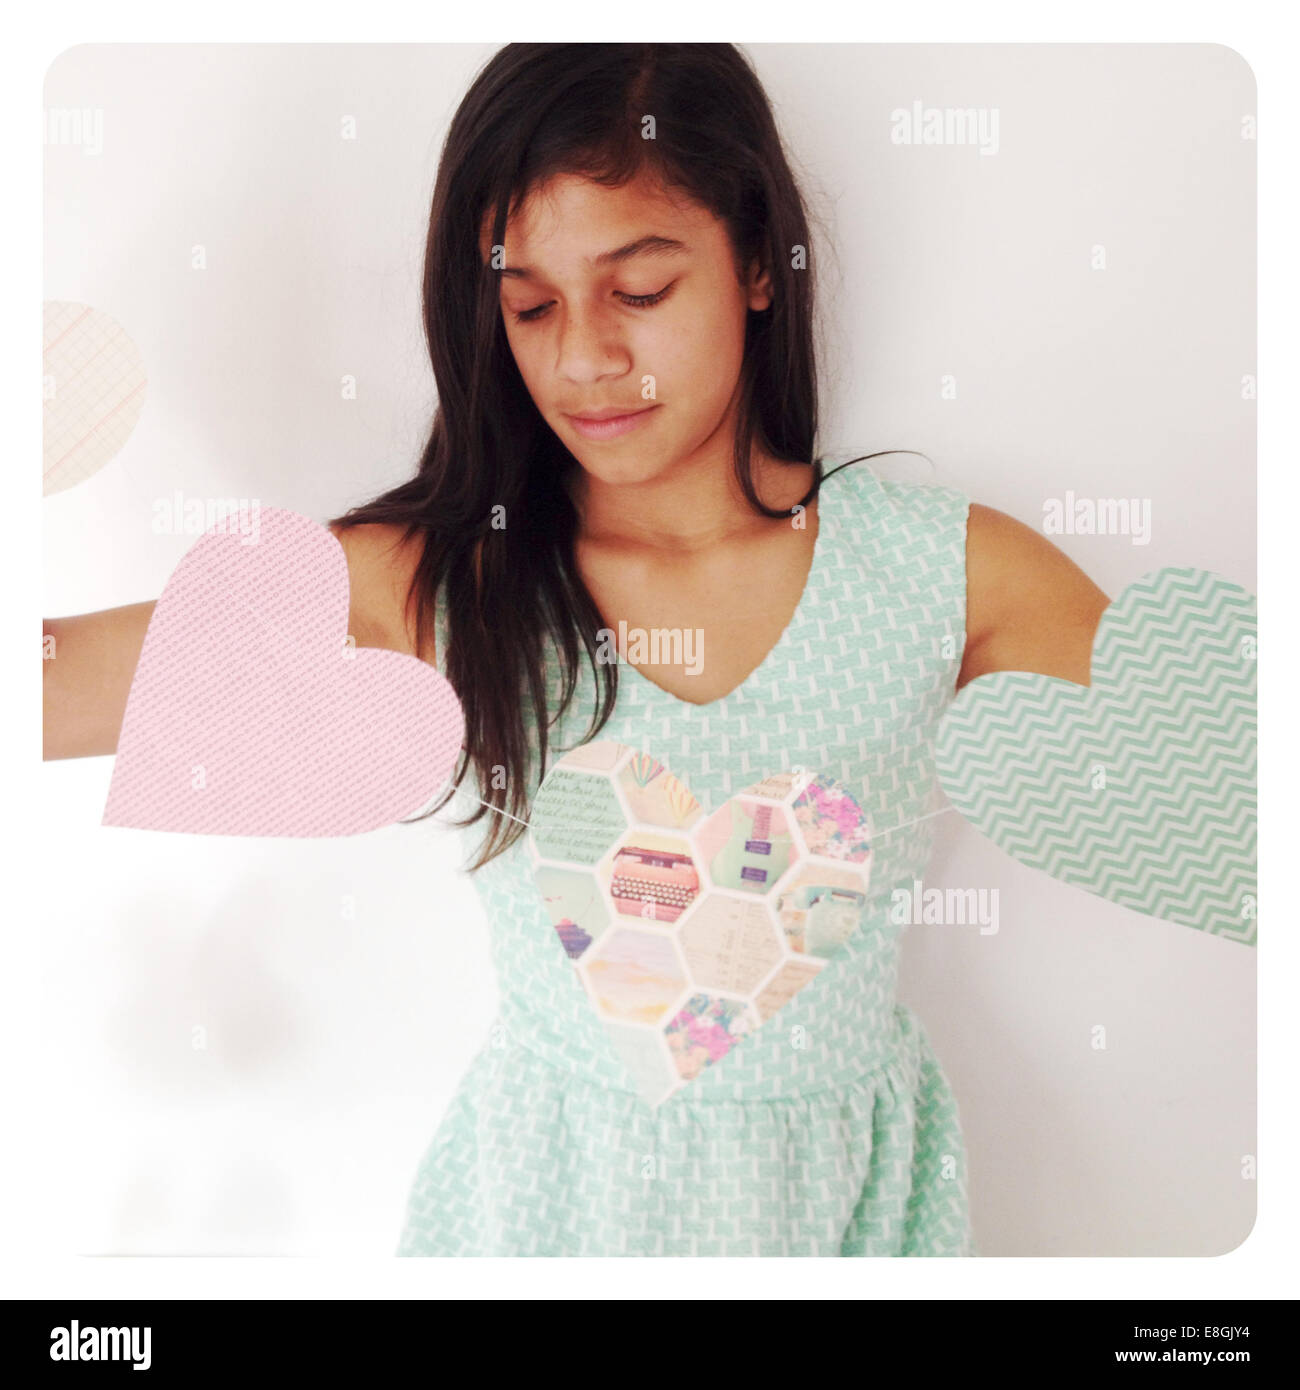 Chica sujetando pancartas con forma de corazón Imagen De Stock